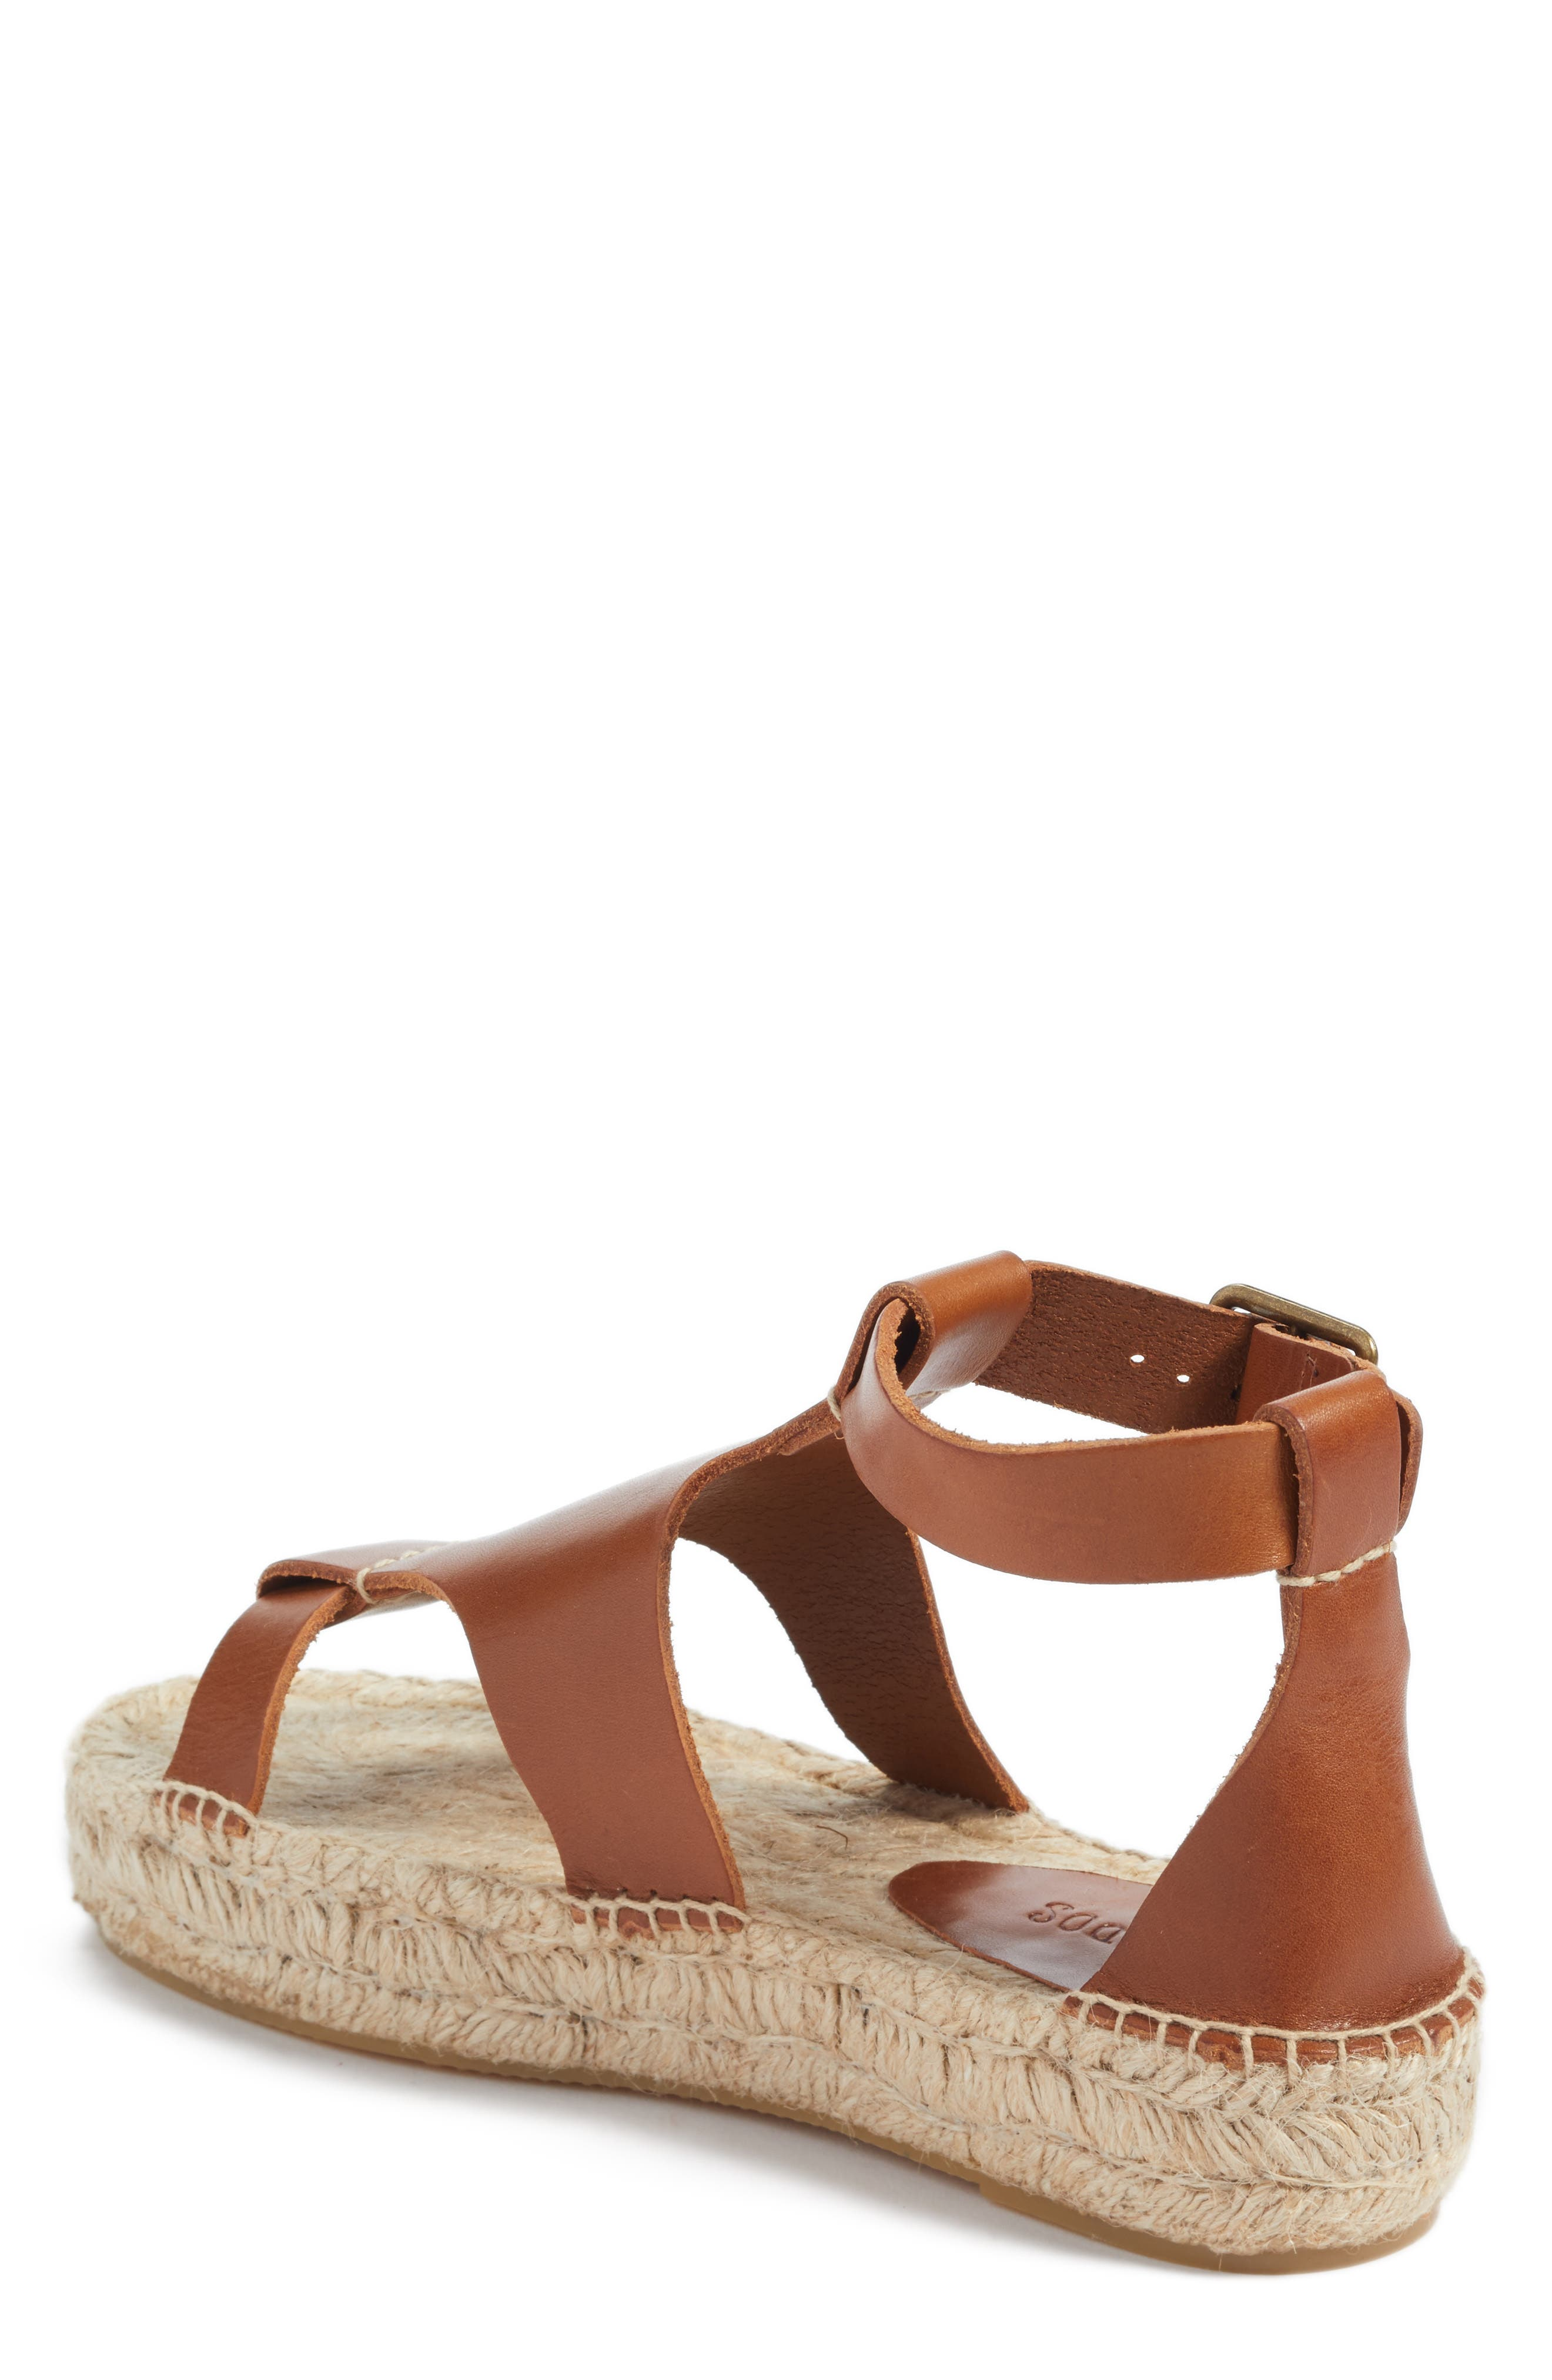 Strappy Espadrille Sandal,                             Alternate thumbnail 2, color,                             Walnut Leather